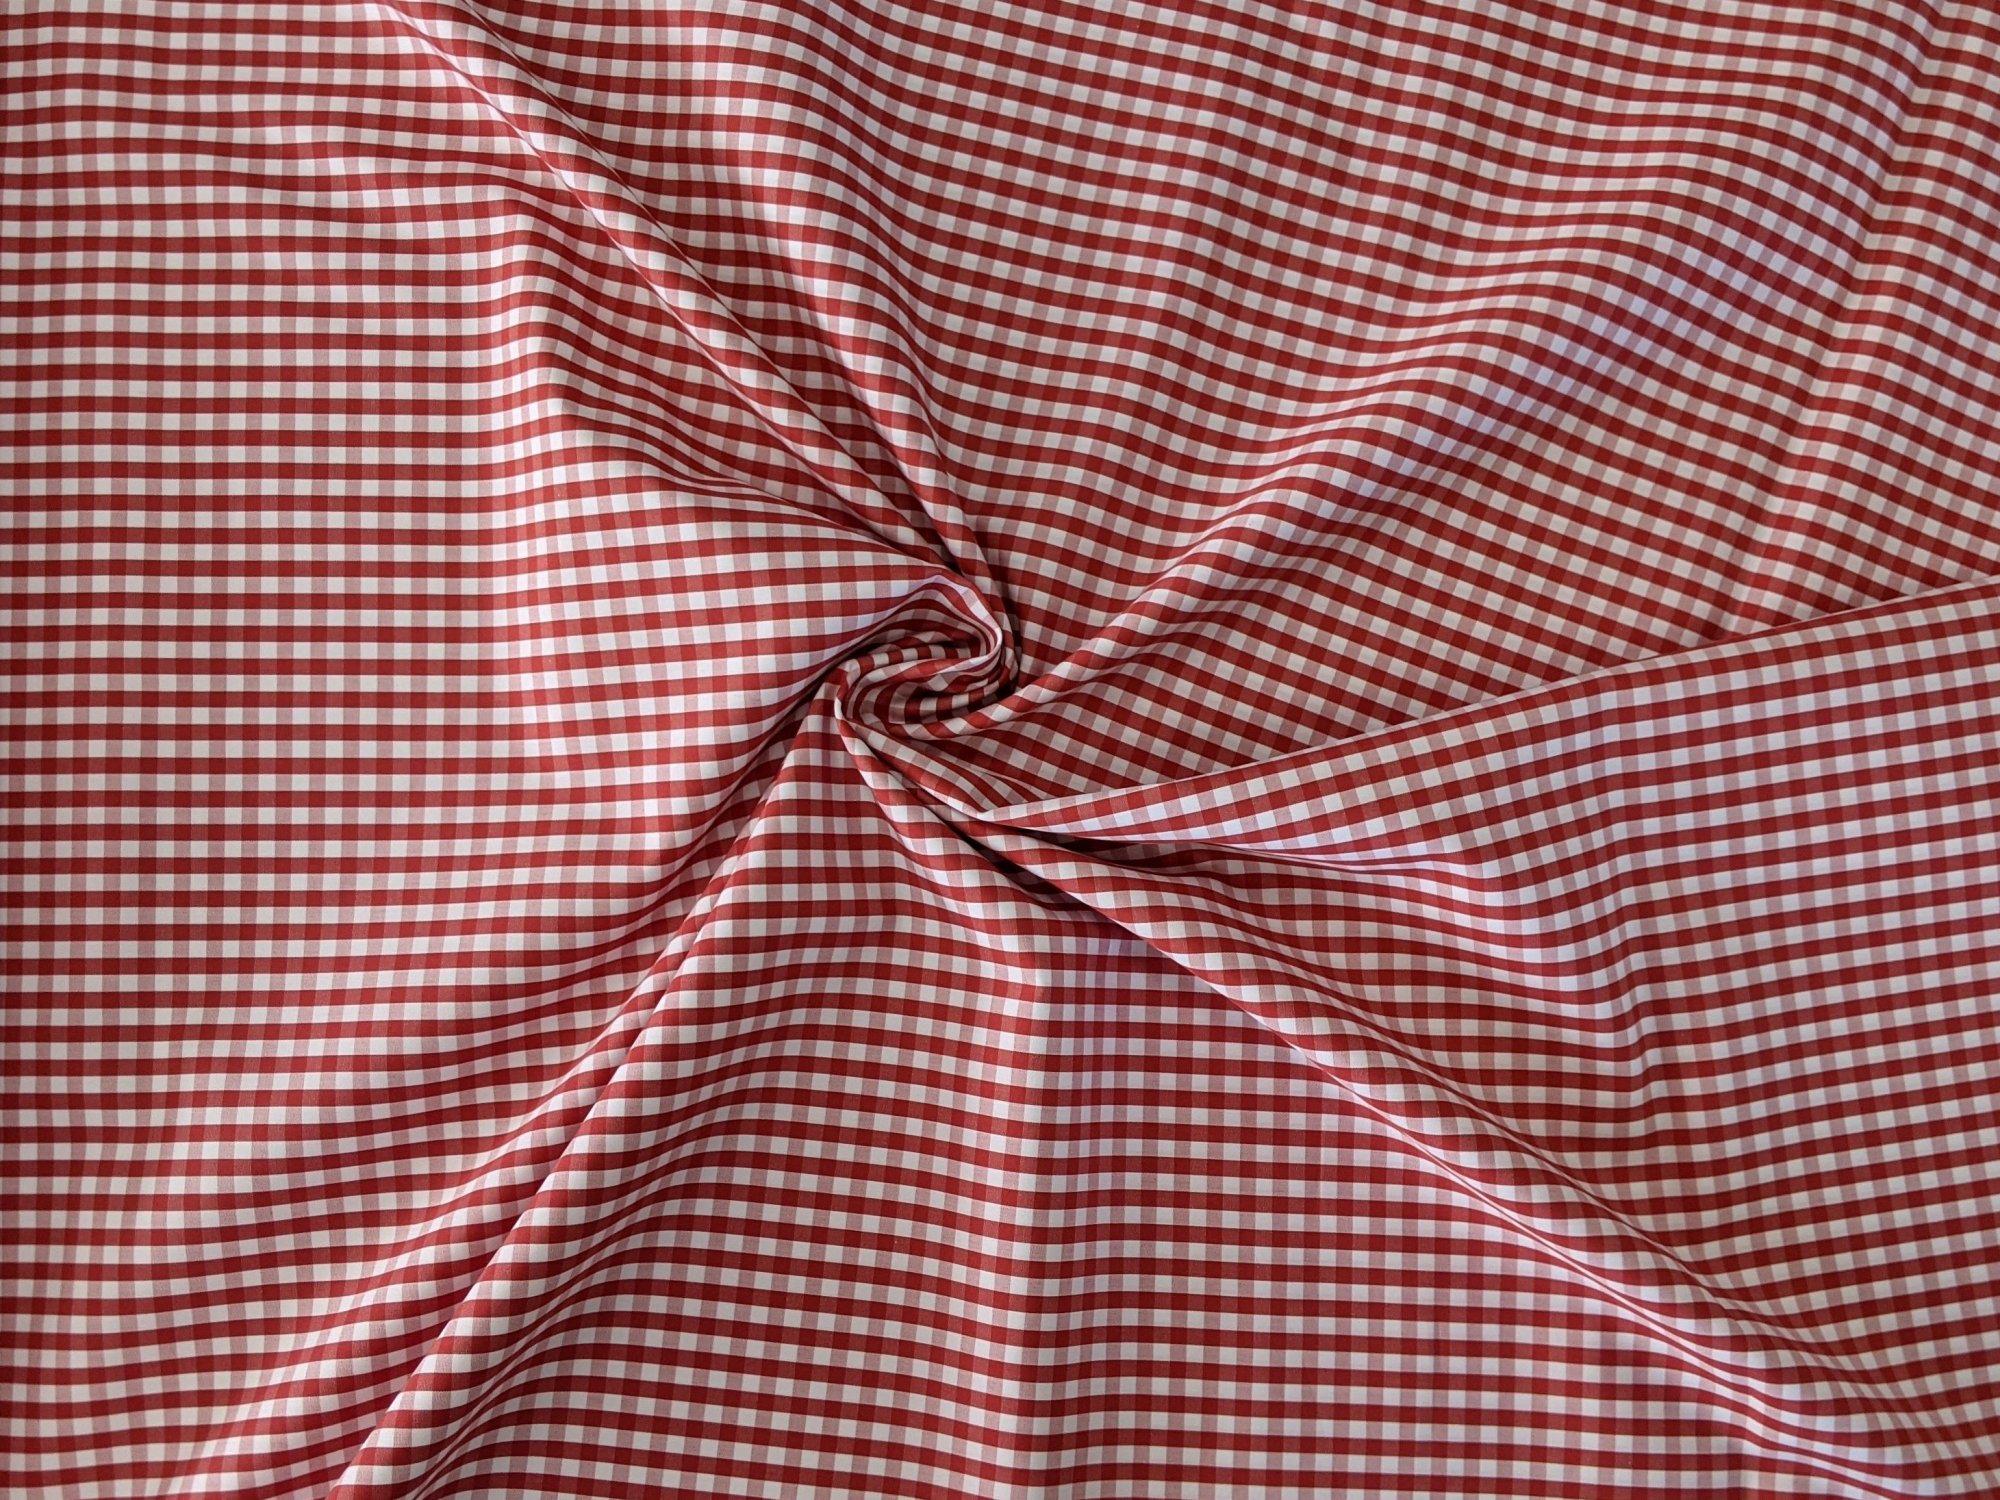 Cotton Shirting - Red/White